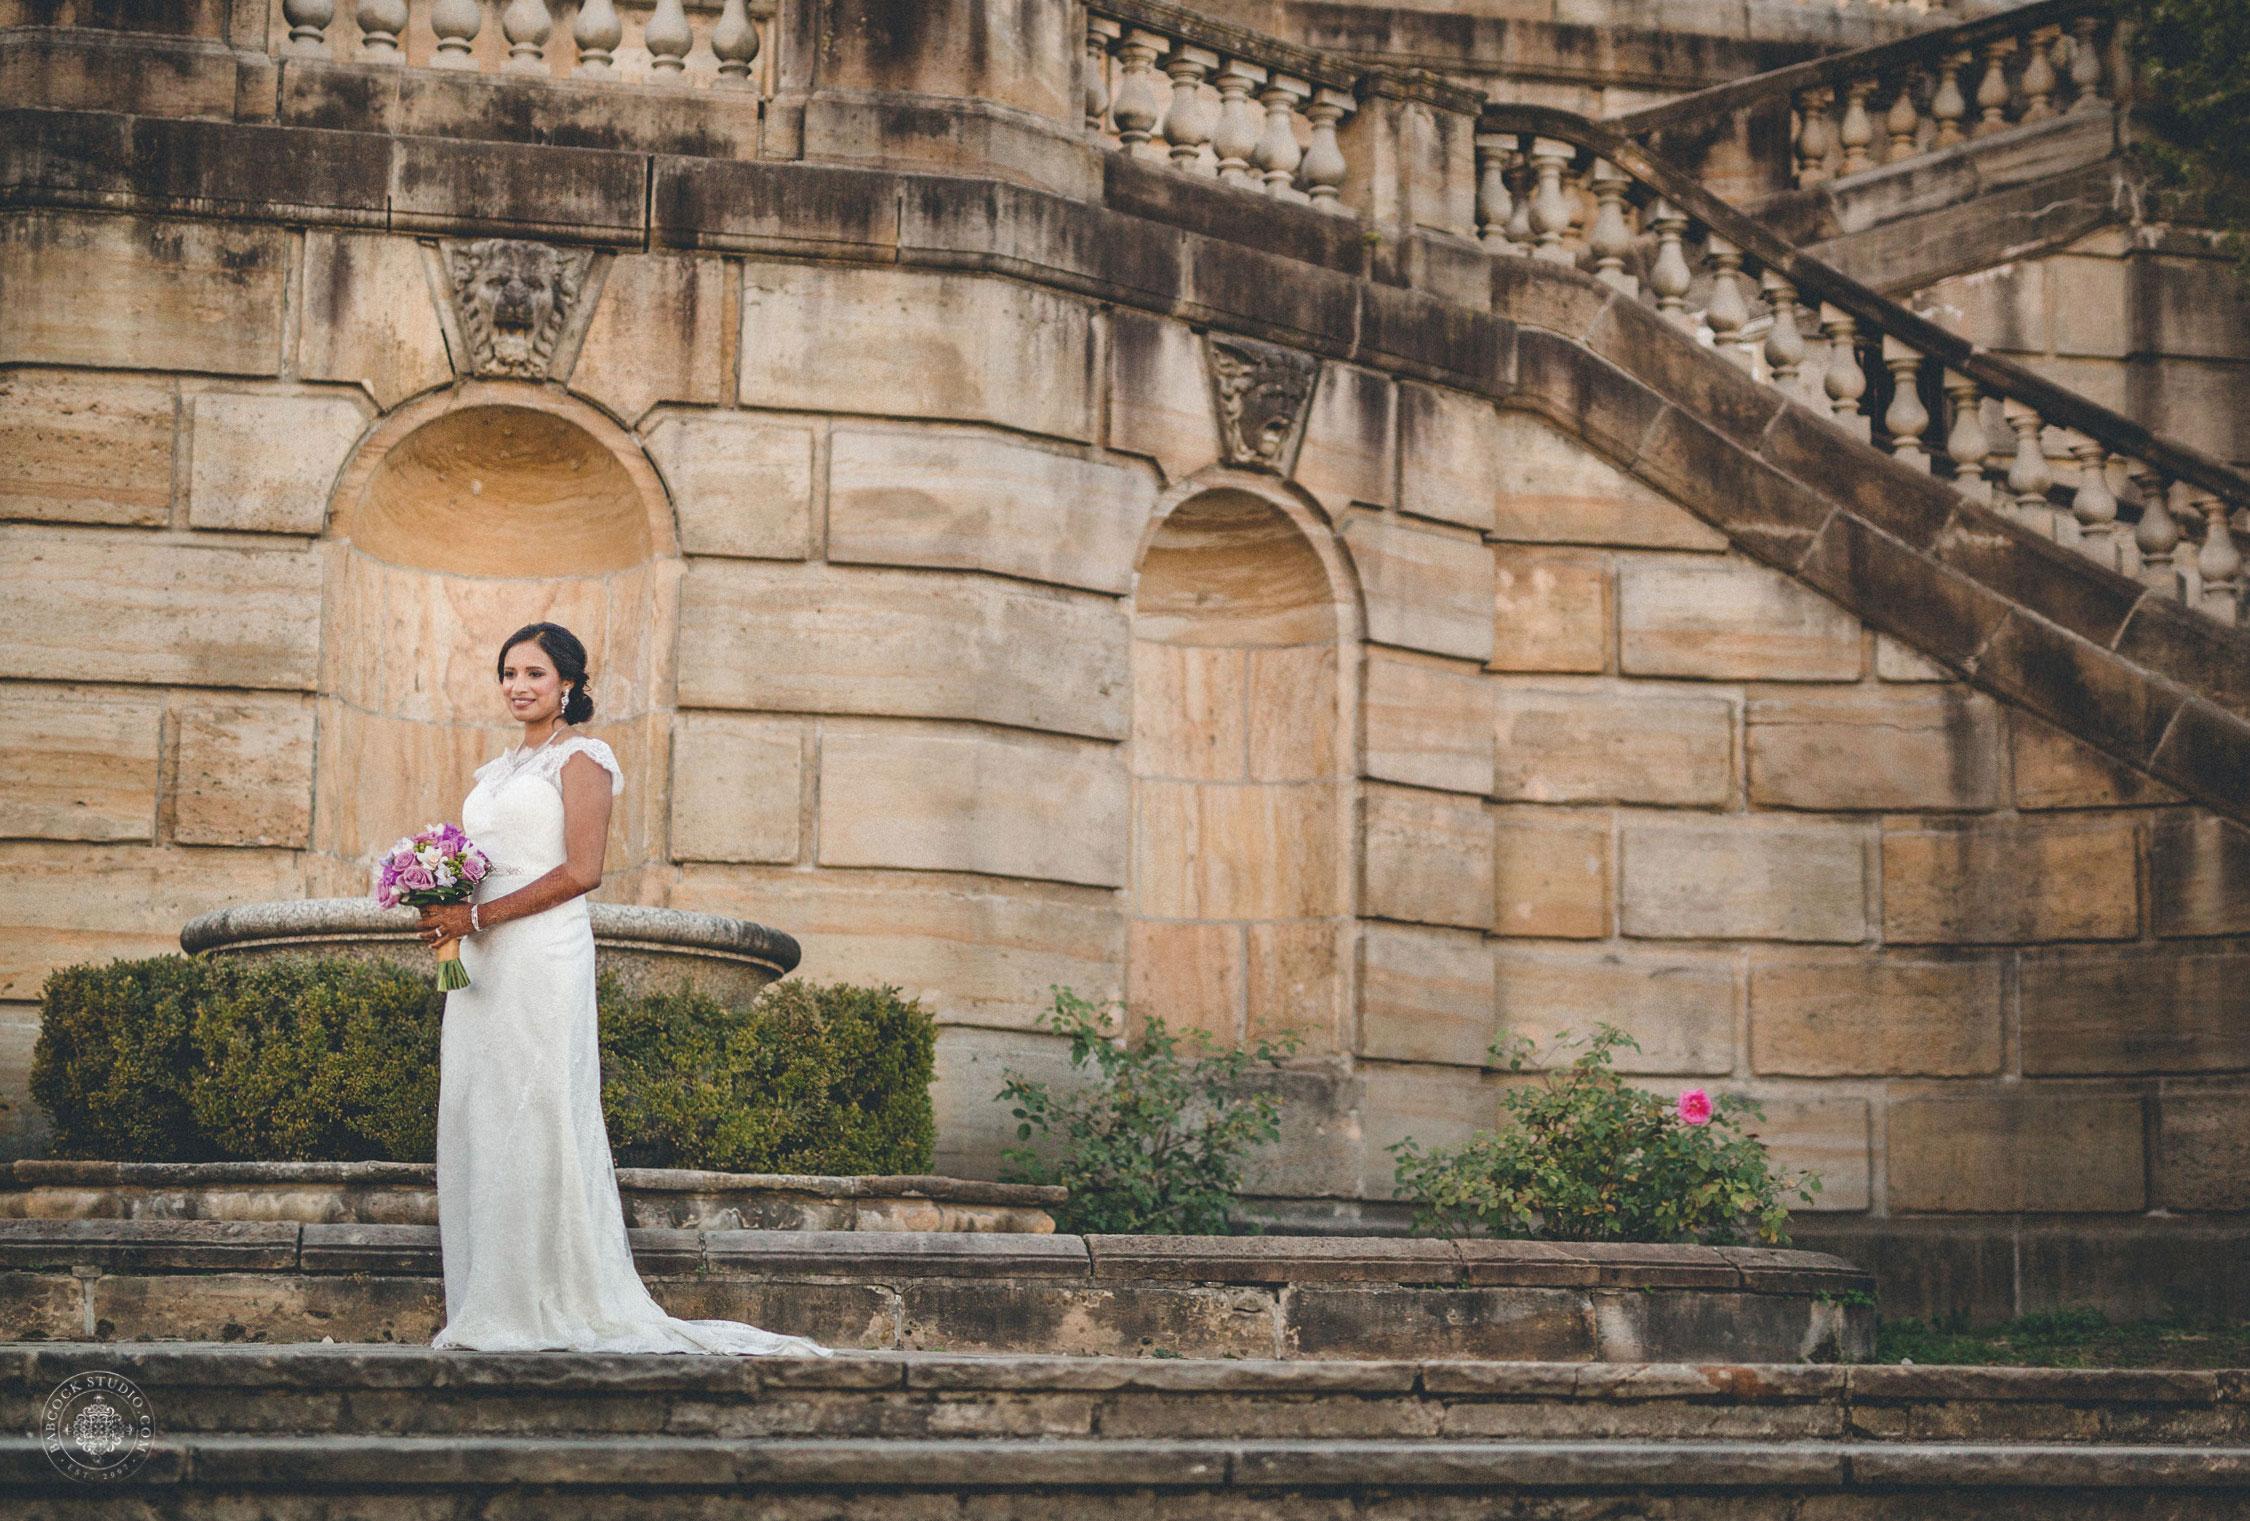 mayuri-brent-indian-wedding-photographer-dayton-ohio-30.jpg